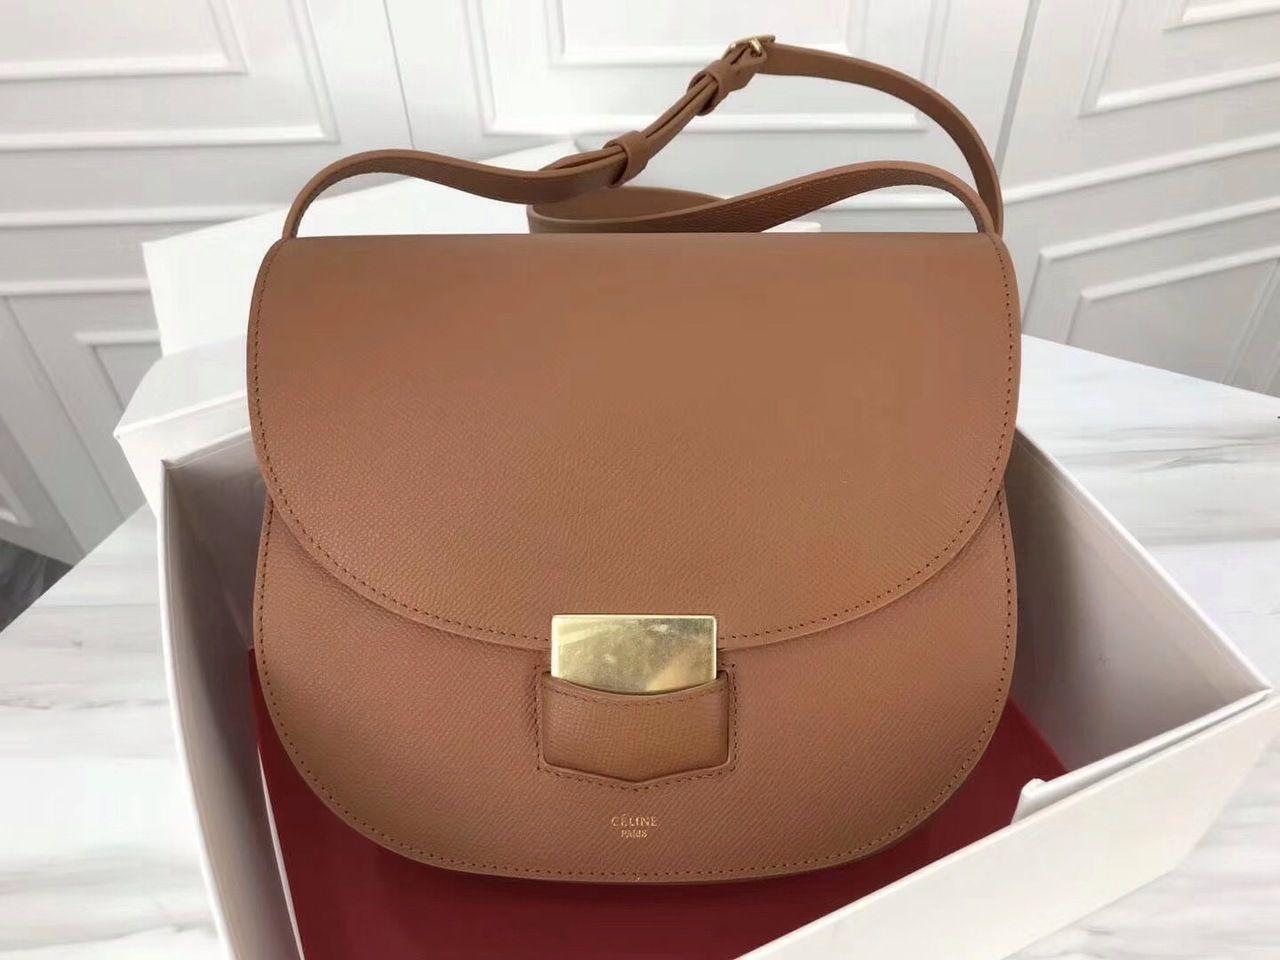 015b4851047e Celine COMPACT TROTTEUR BAG IN GRAINED CALFSKIN Tan - Bella Vita Moda  #celine  celine